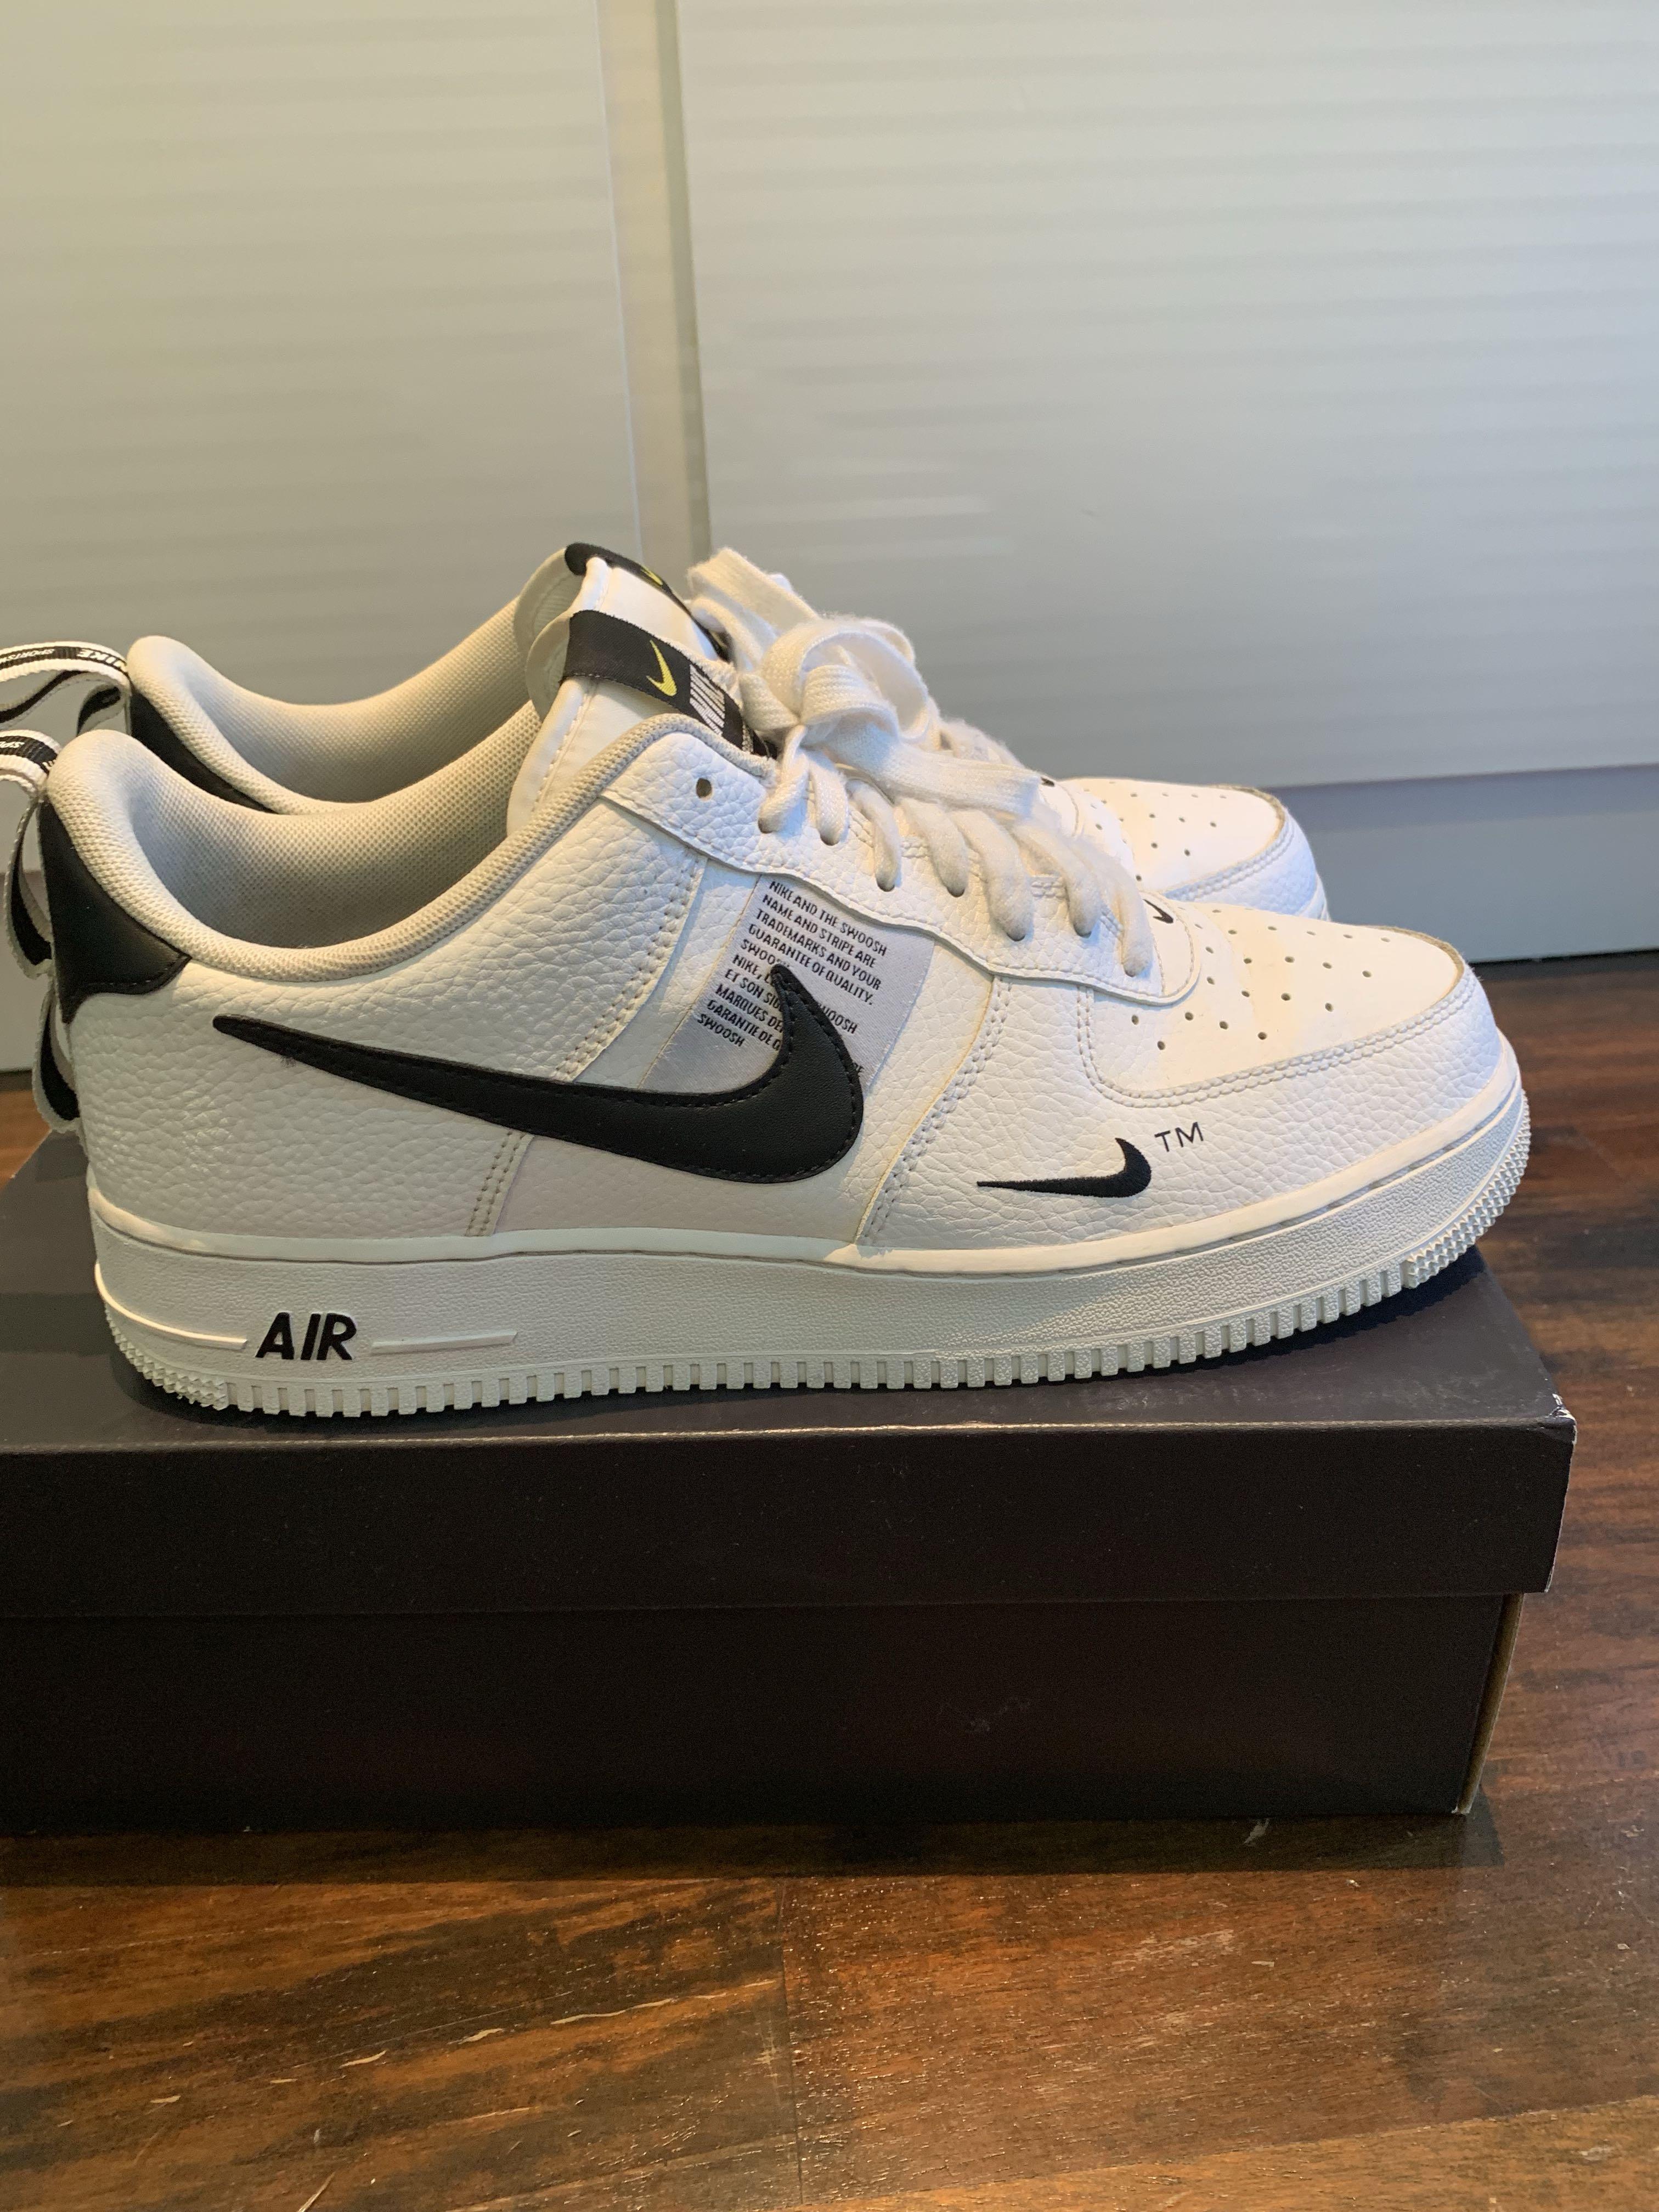 Air Force 1 '07 utility low, Men's Fashion, Footwear, Sneakers on